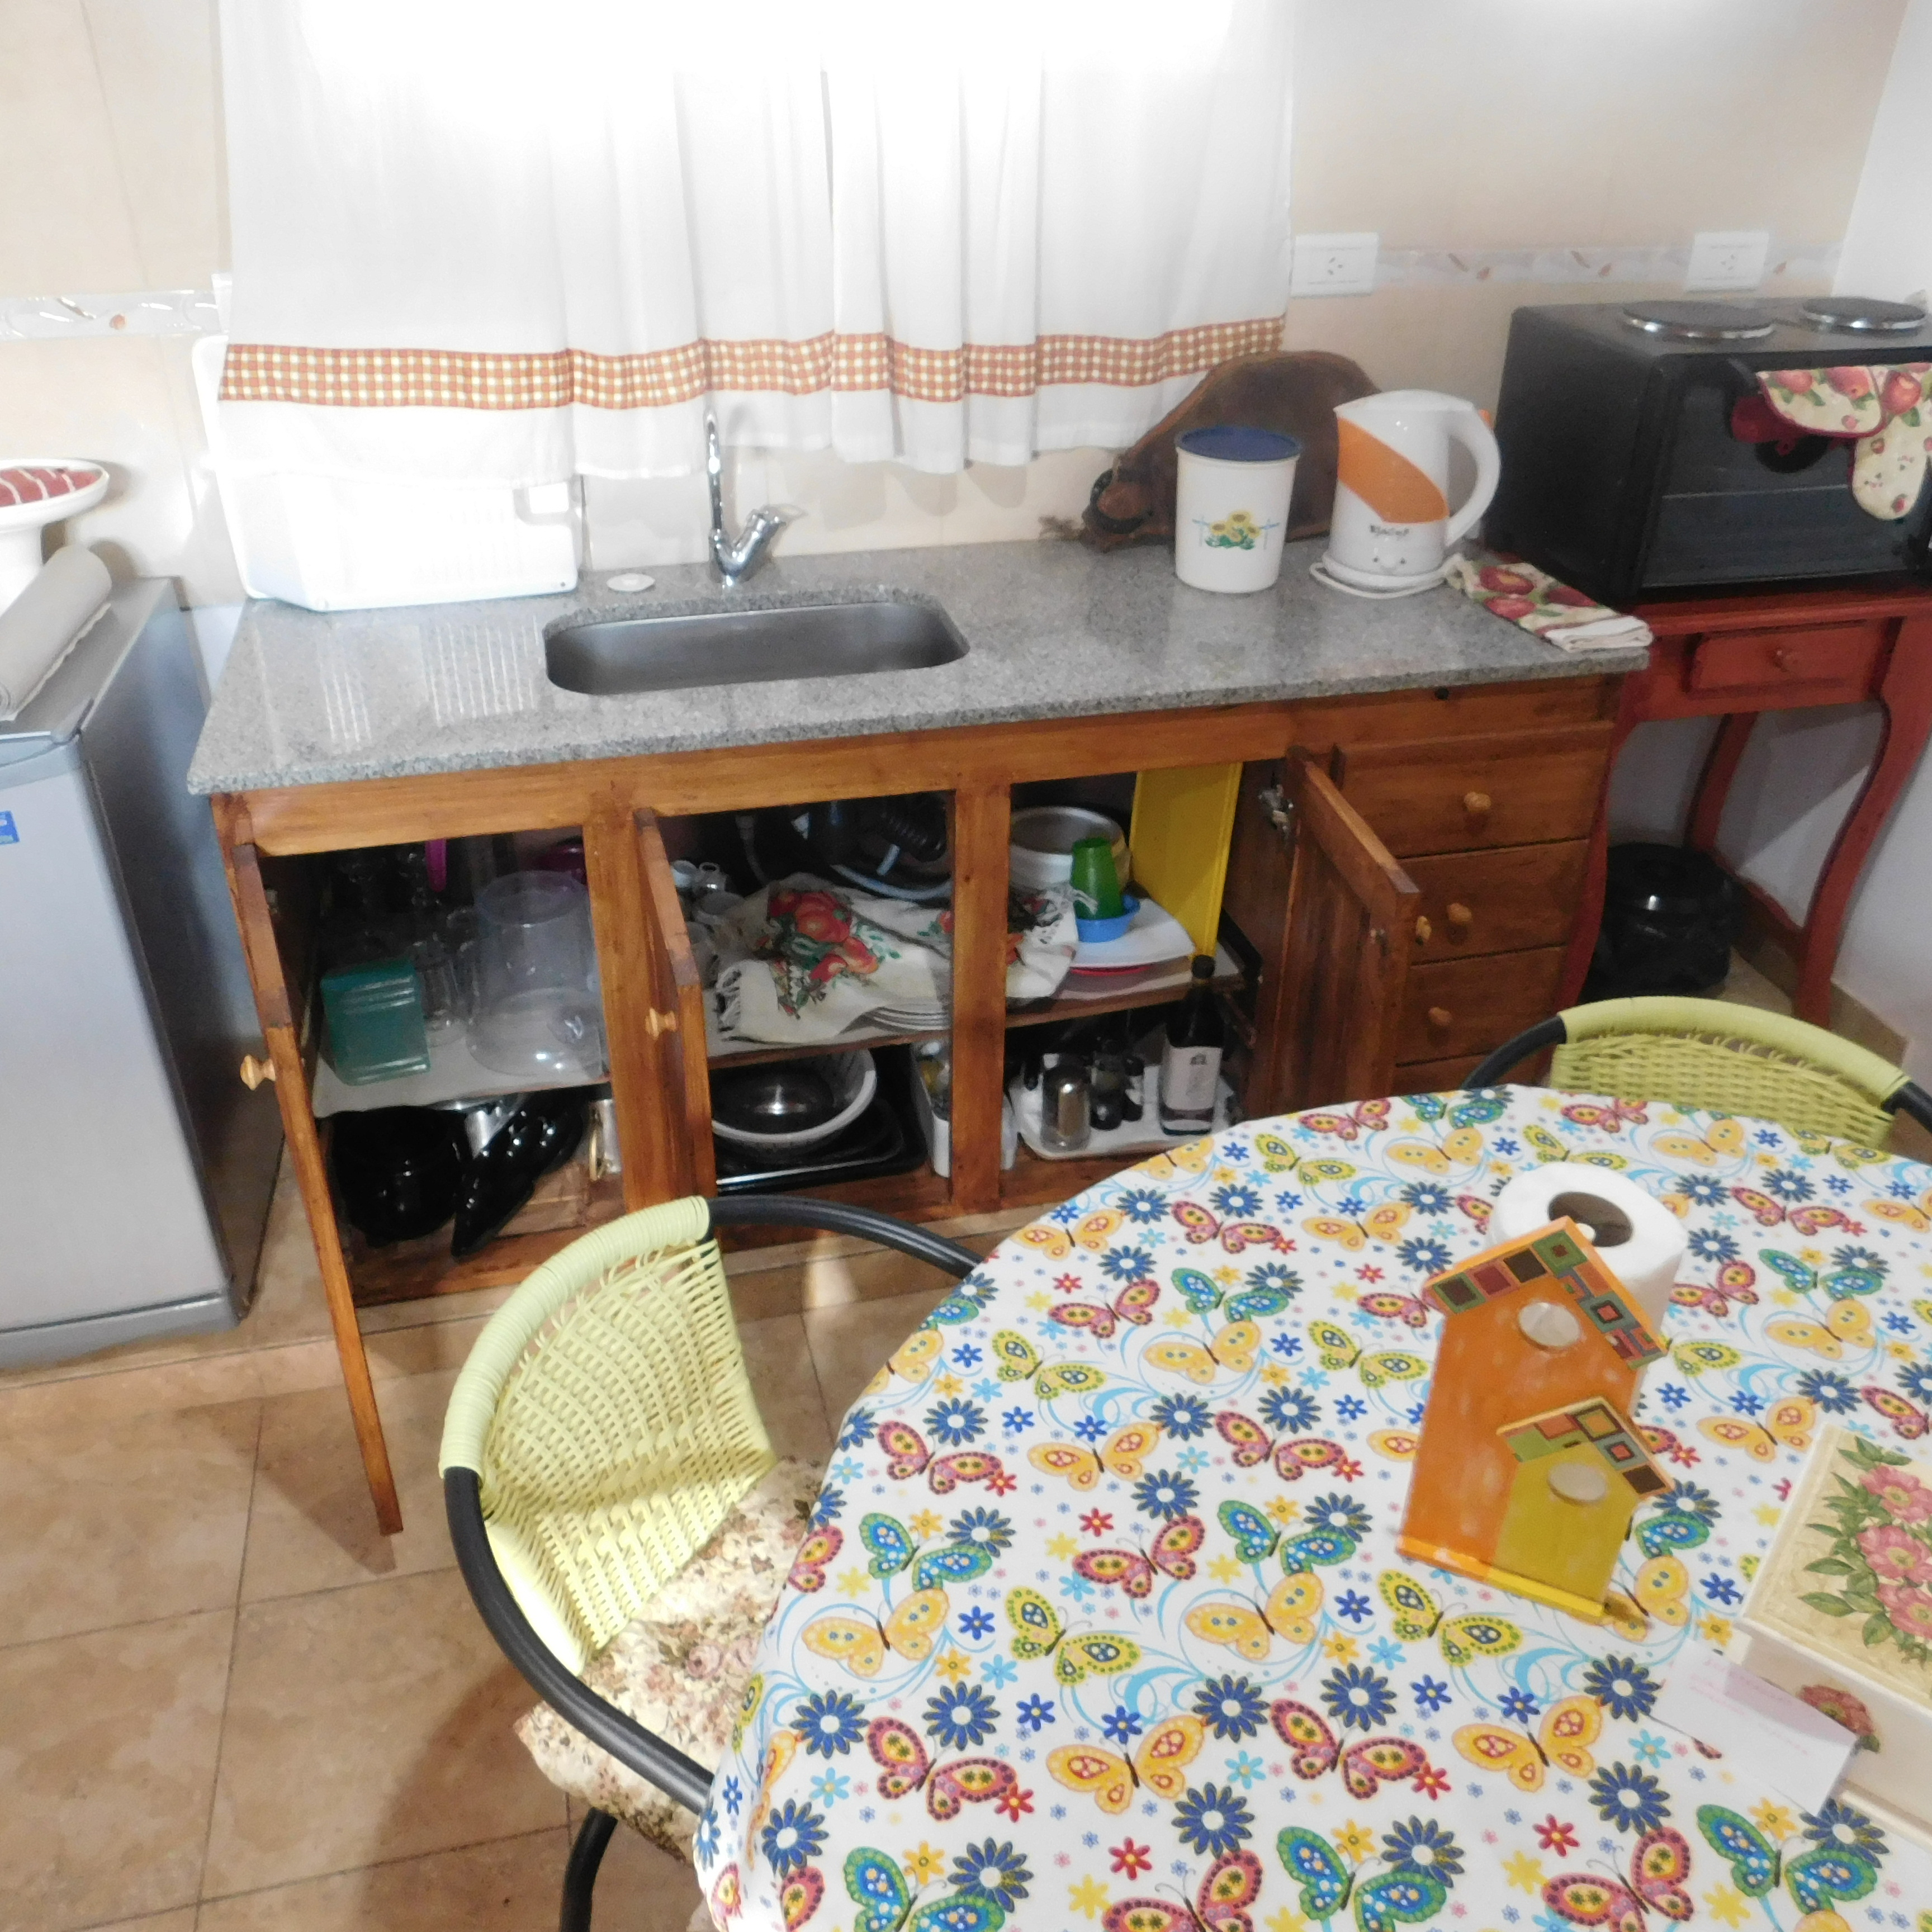 Mesada de cocina con utensillos